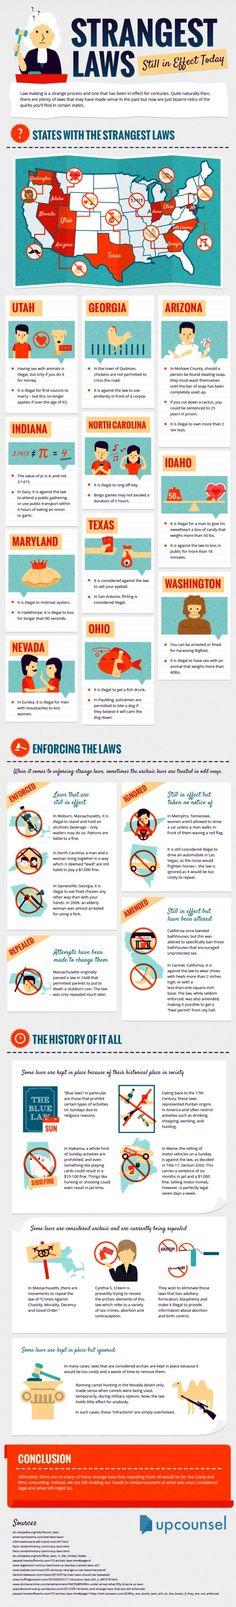 Strangest Laws Still in Effect Today #infographics #america #strange